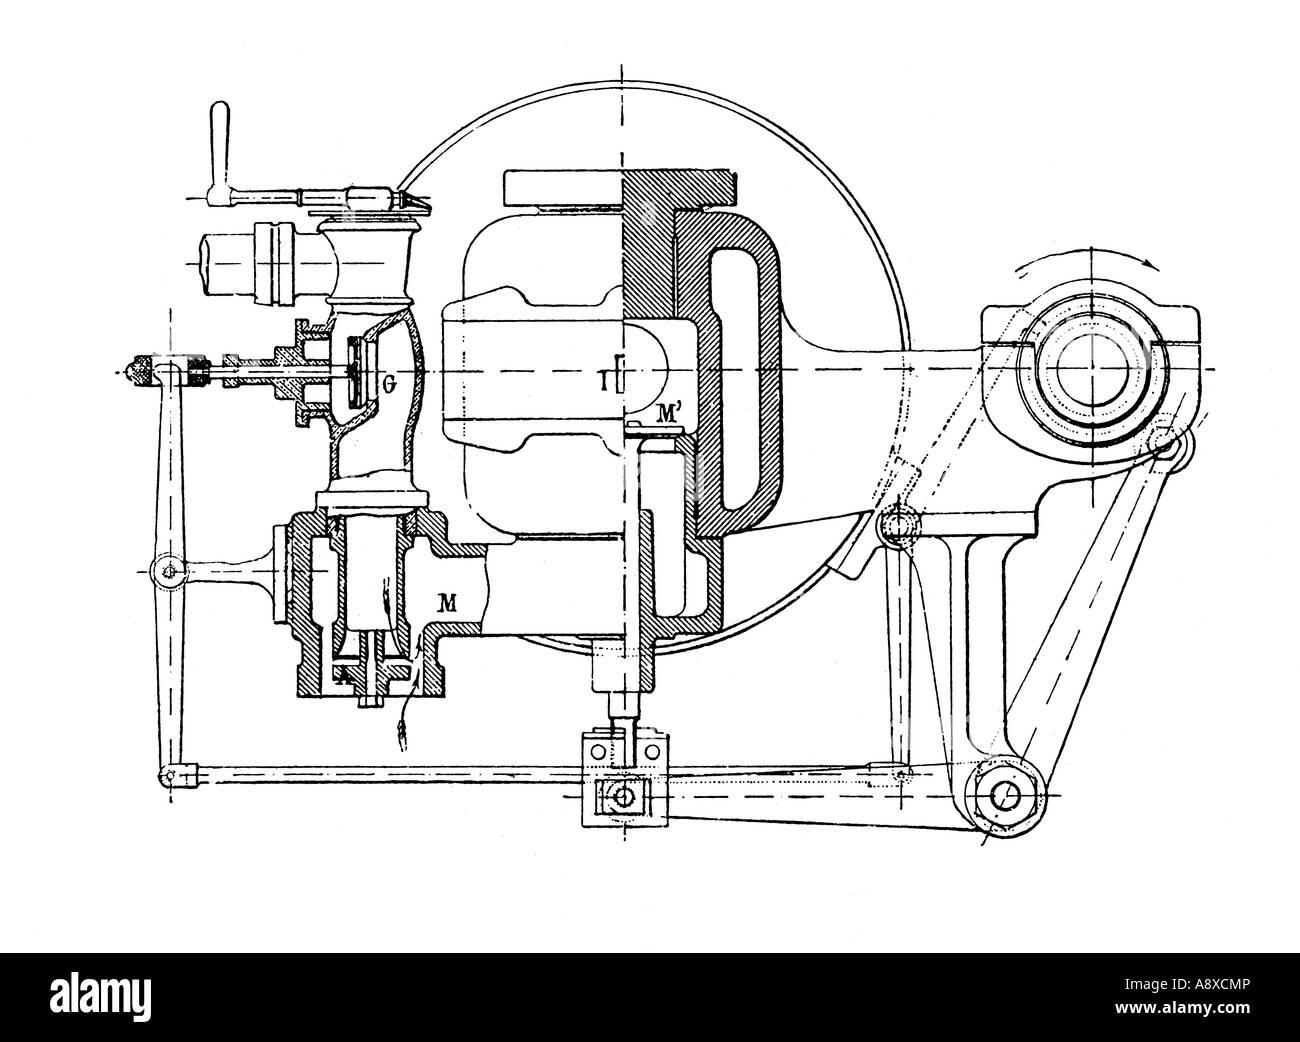 Otto Engine Stock Photos Images Alamy Steam Valve Diagram Gas Burning Valves Image